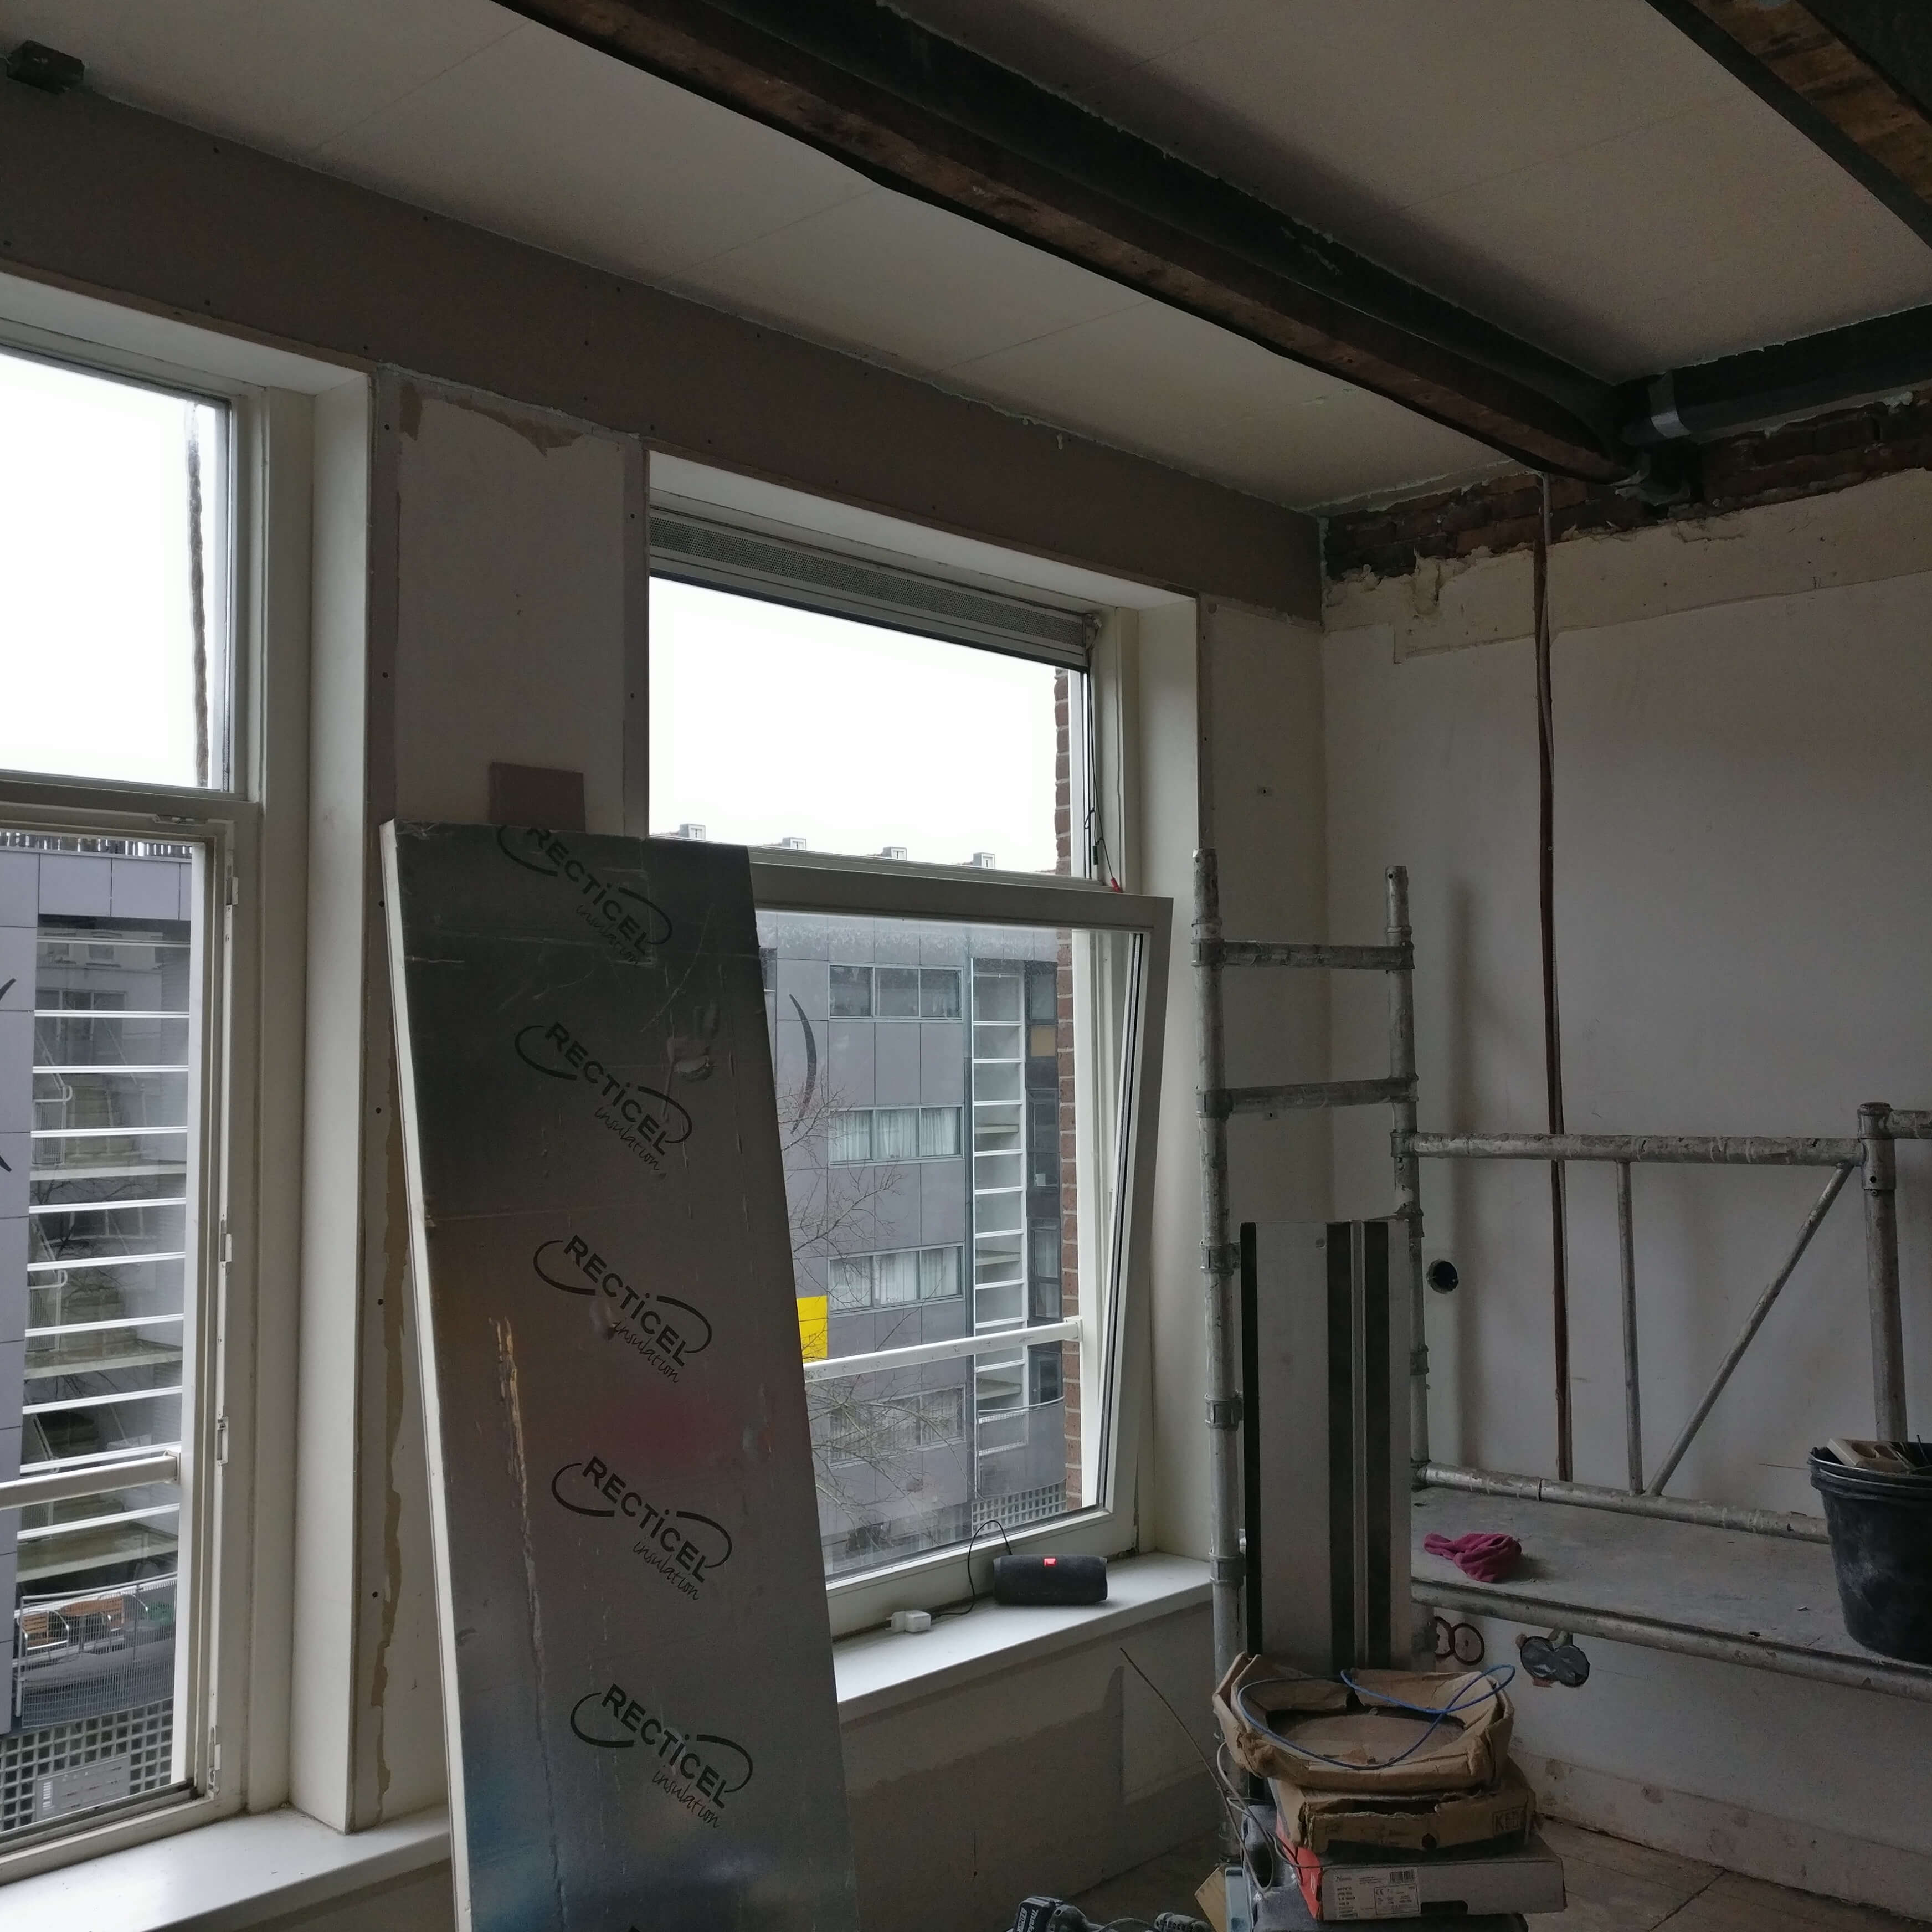 Isolatie plafond duurzaam energie besparen